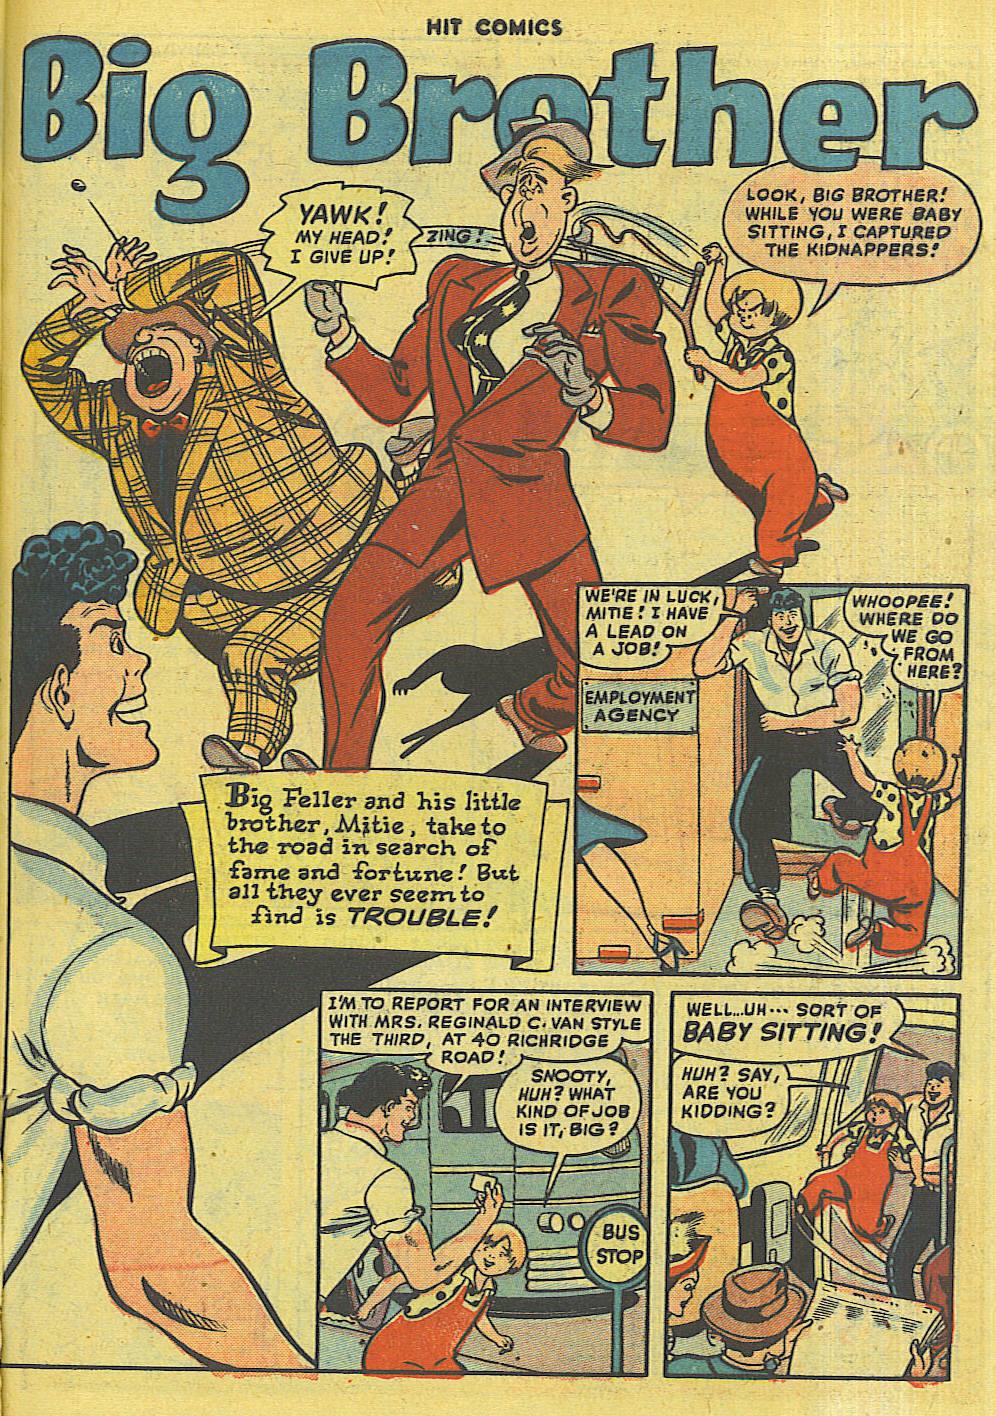 Read online Hit Comics comic -  Issue #56 - 43